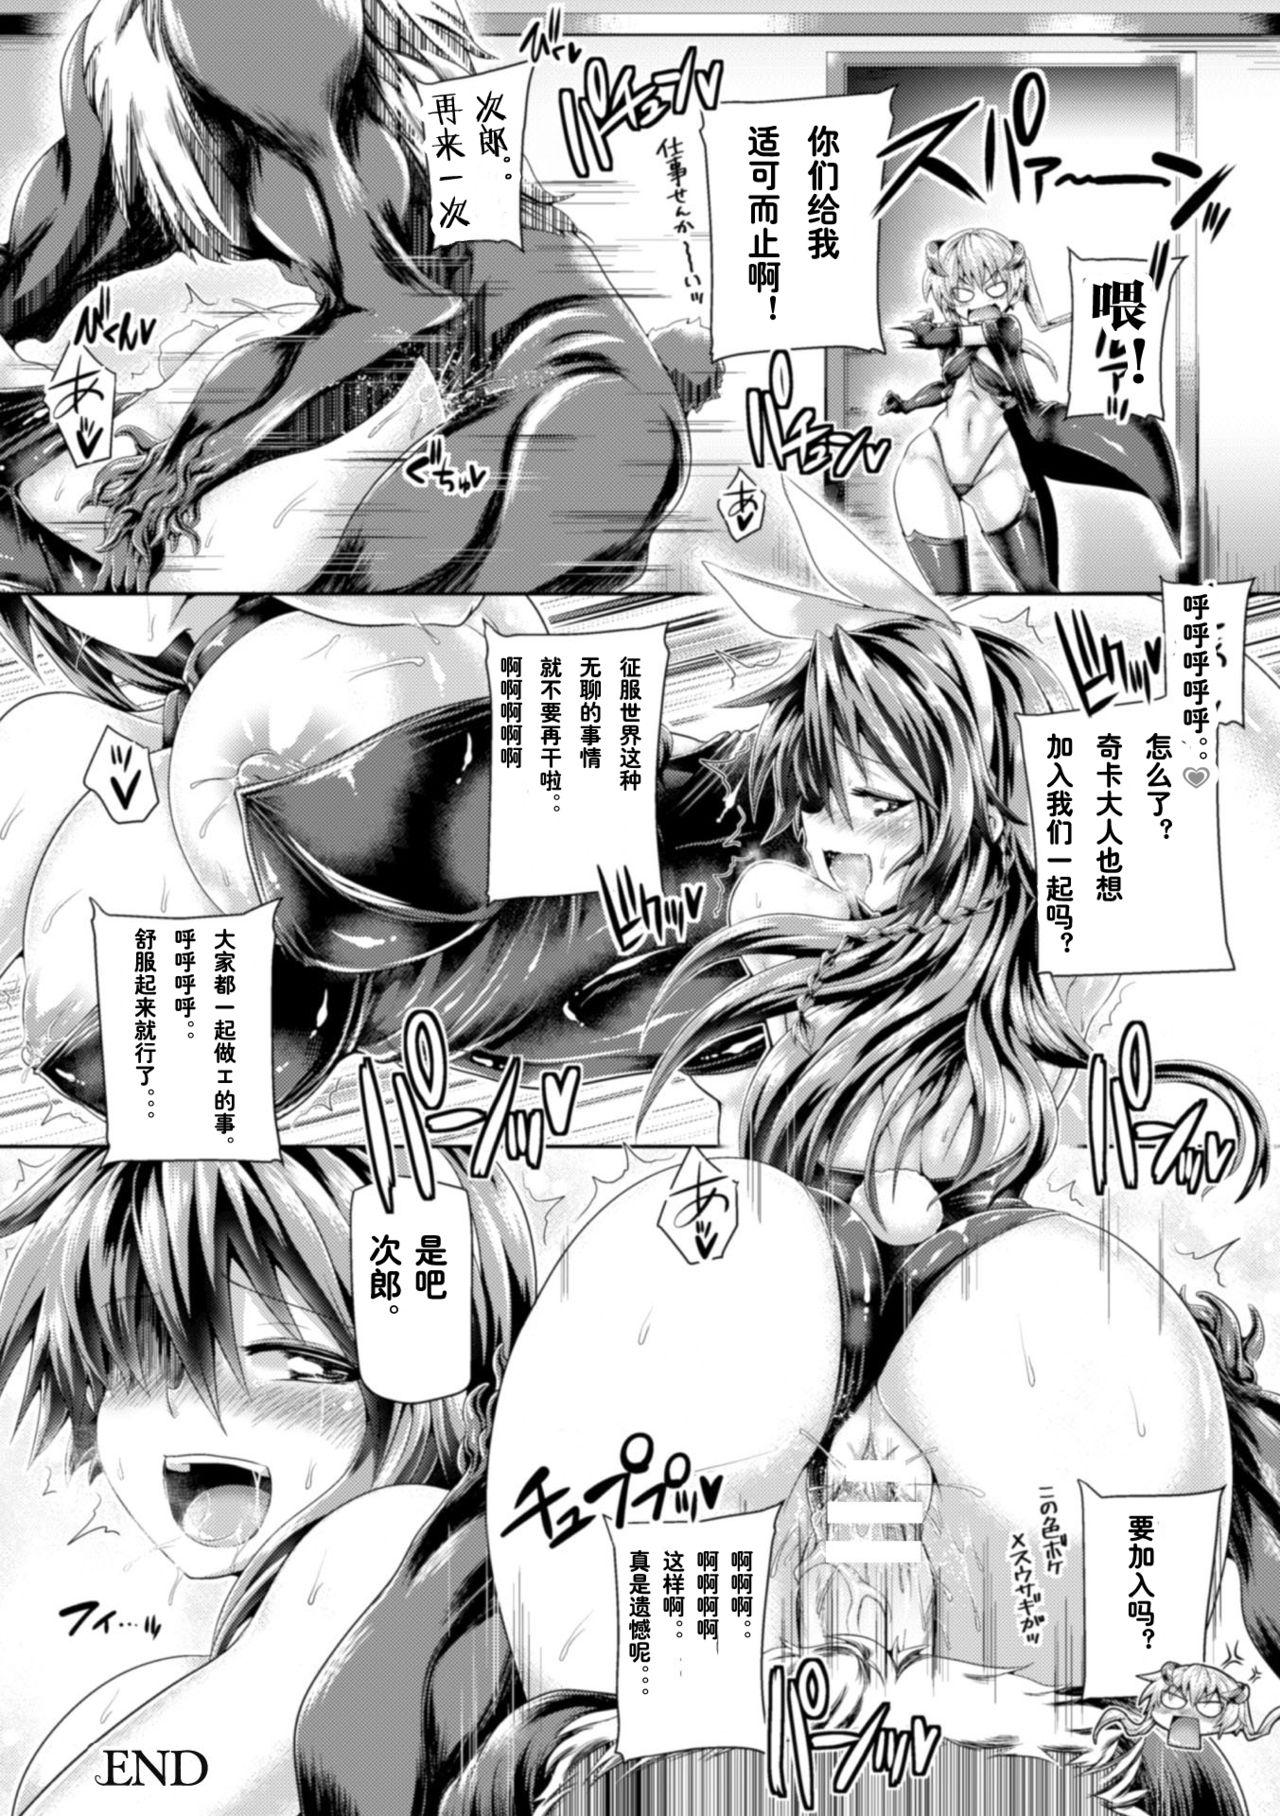 [Anthology] 2D Comic Magazine Tenshi ni Ochiru Akuma-tachi Vol. 1 Ch. 1-2 [Chinese] [这很恶堕汉化组] [Digital] 43